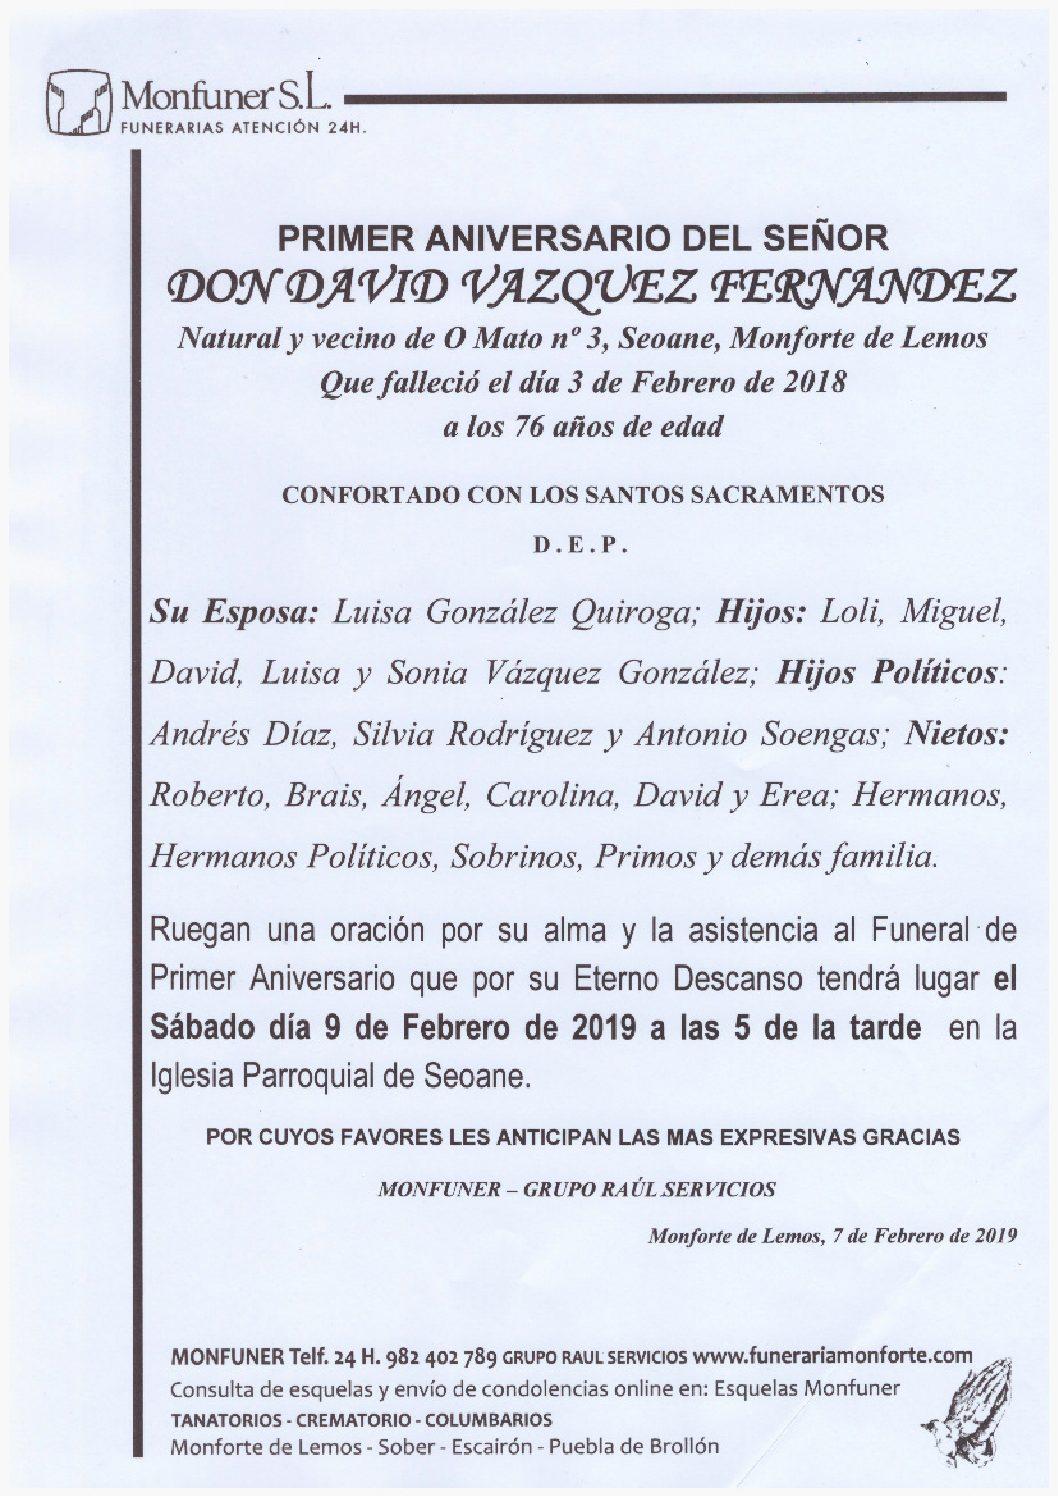 PRIMER ANIVERSARIO DE DON DAVID VAZQUEZ FERNANDEZ